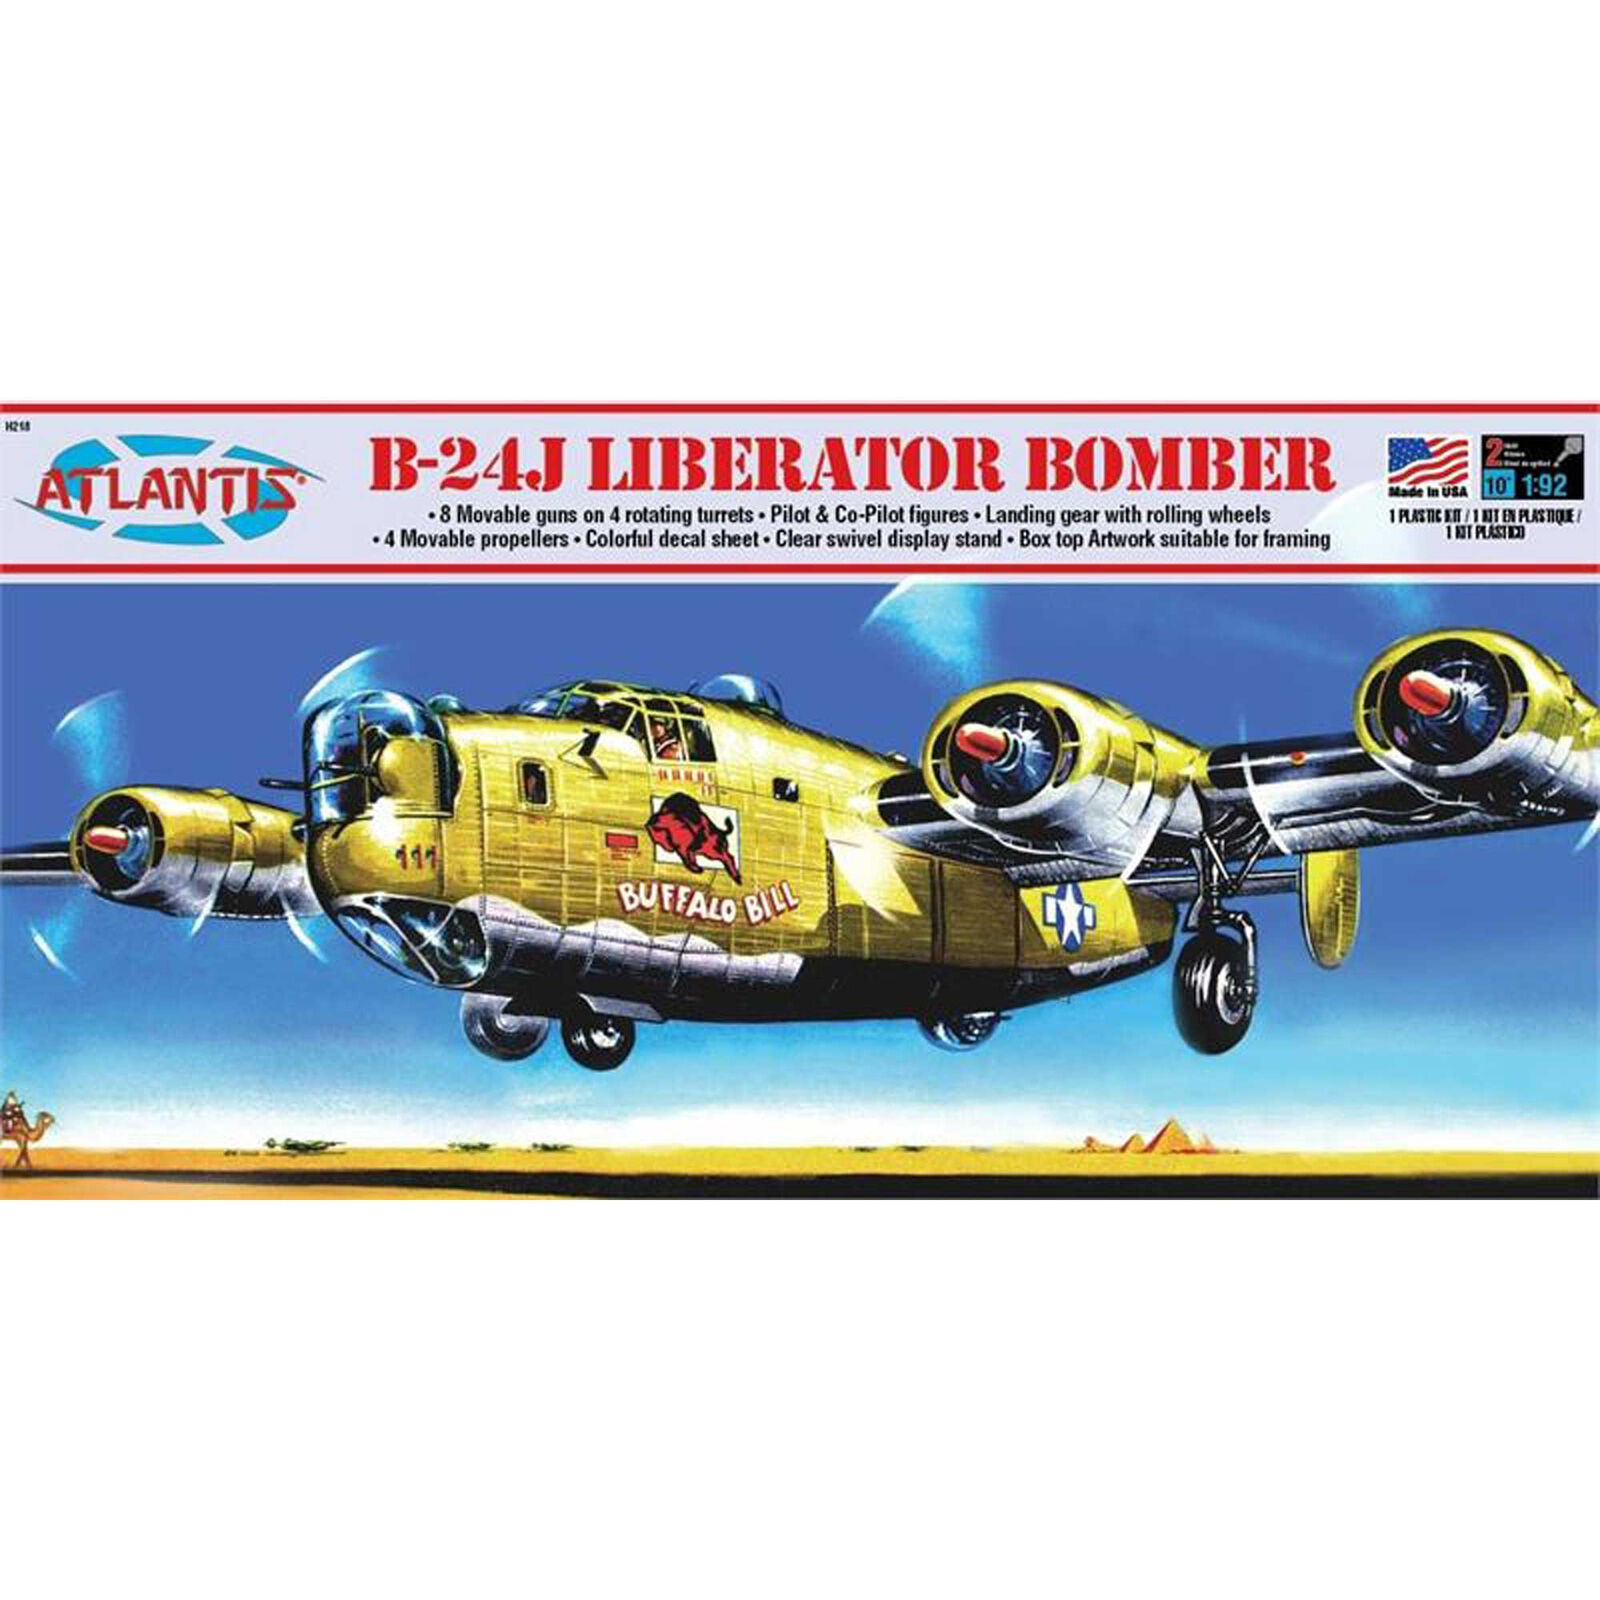 B-24J Liberator Bomber Buffalo Bill 1/92 Model Kit